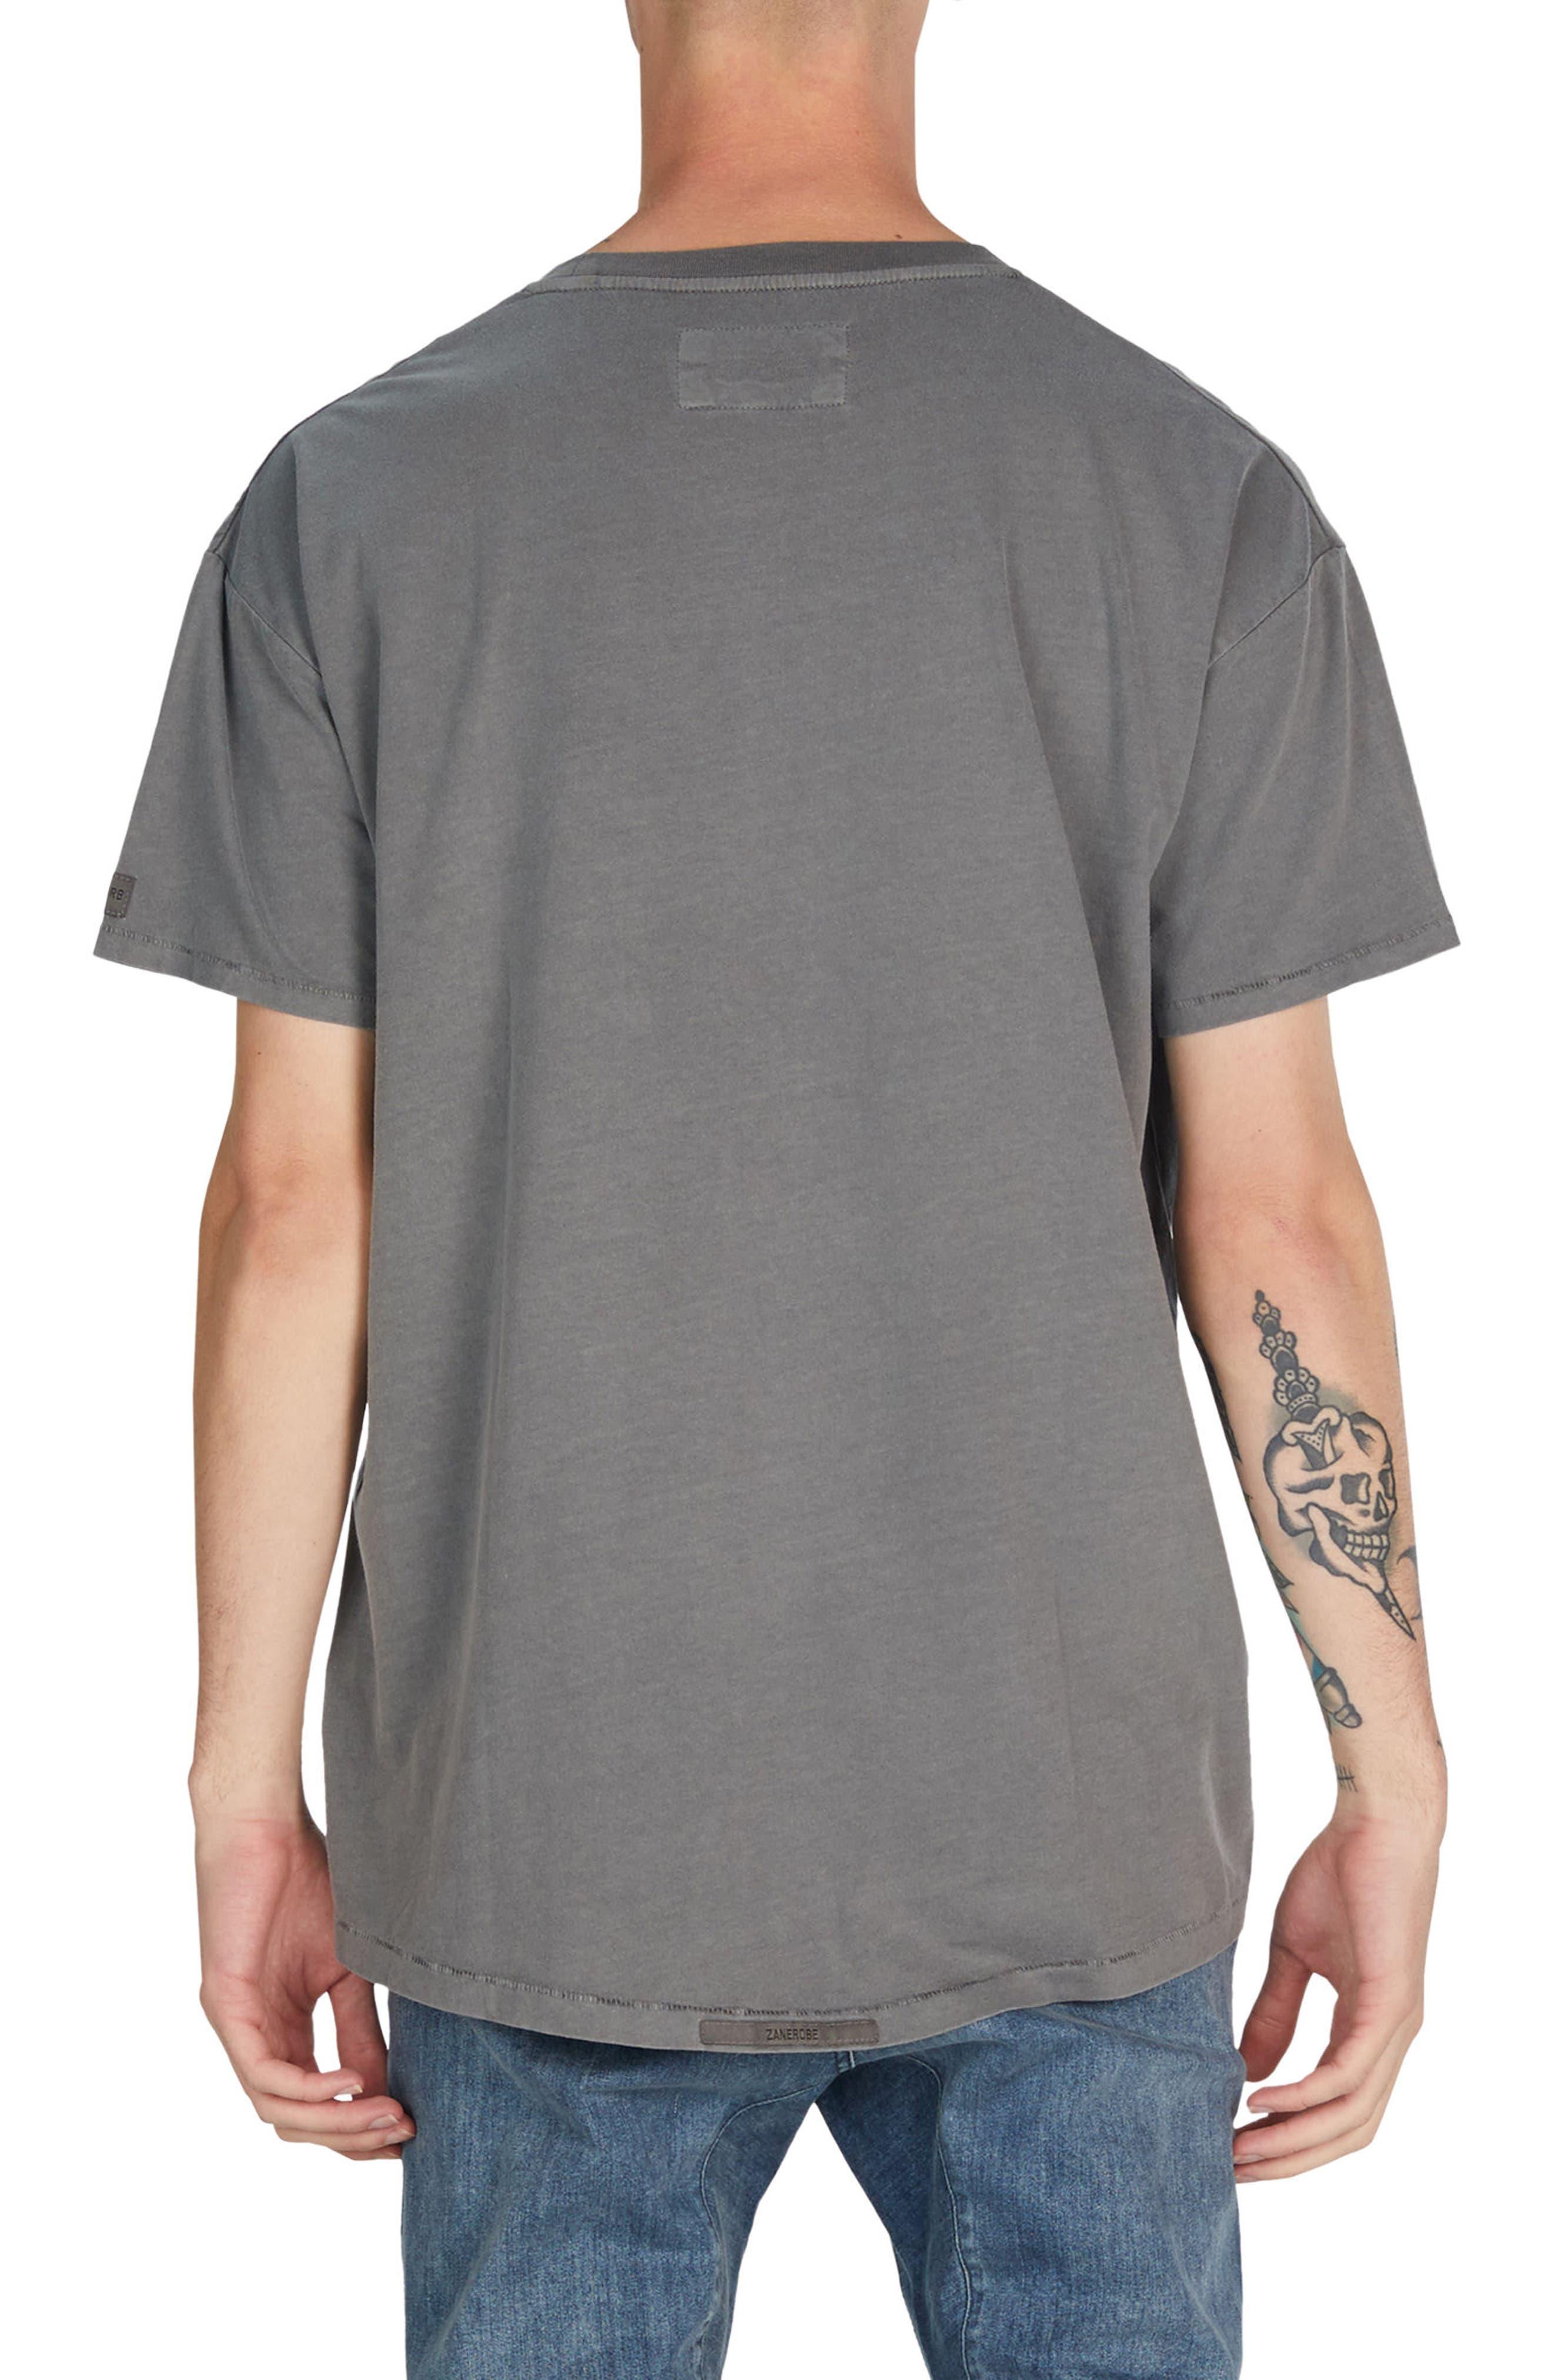 Rugger Pocket T-Shirt,                             Alternate thumbnail 2, color,                             029